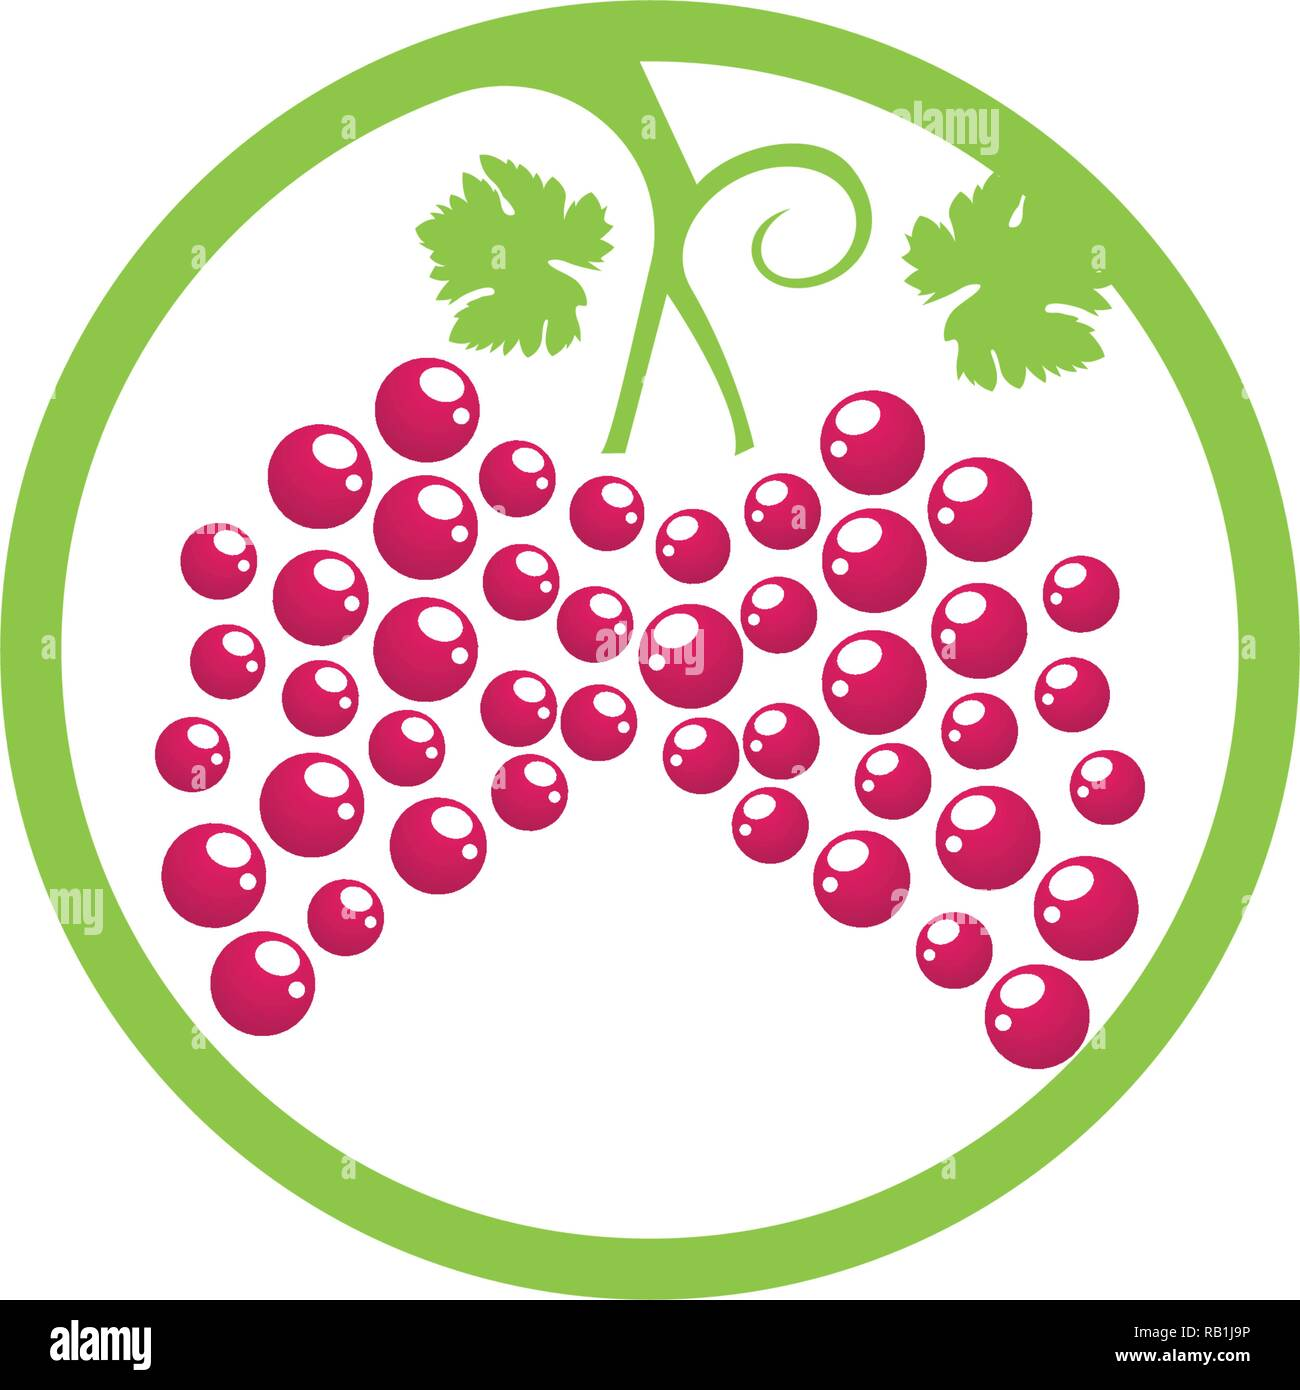 grape purple and green vector illustration - Stock Vector